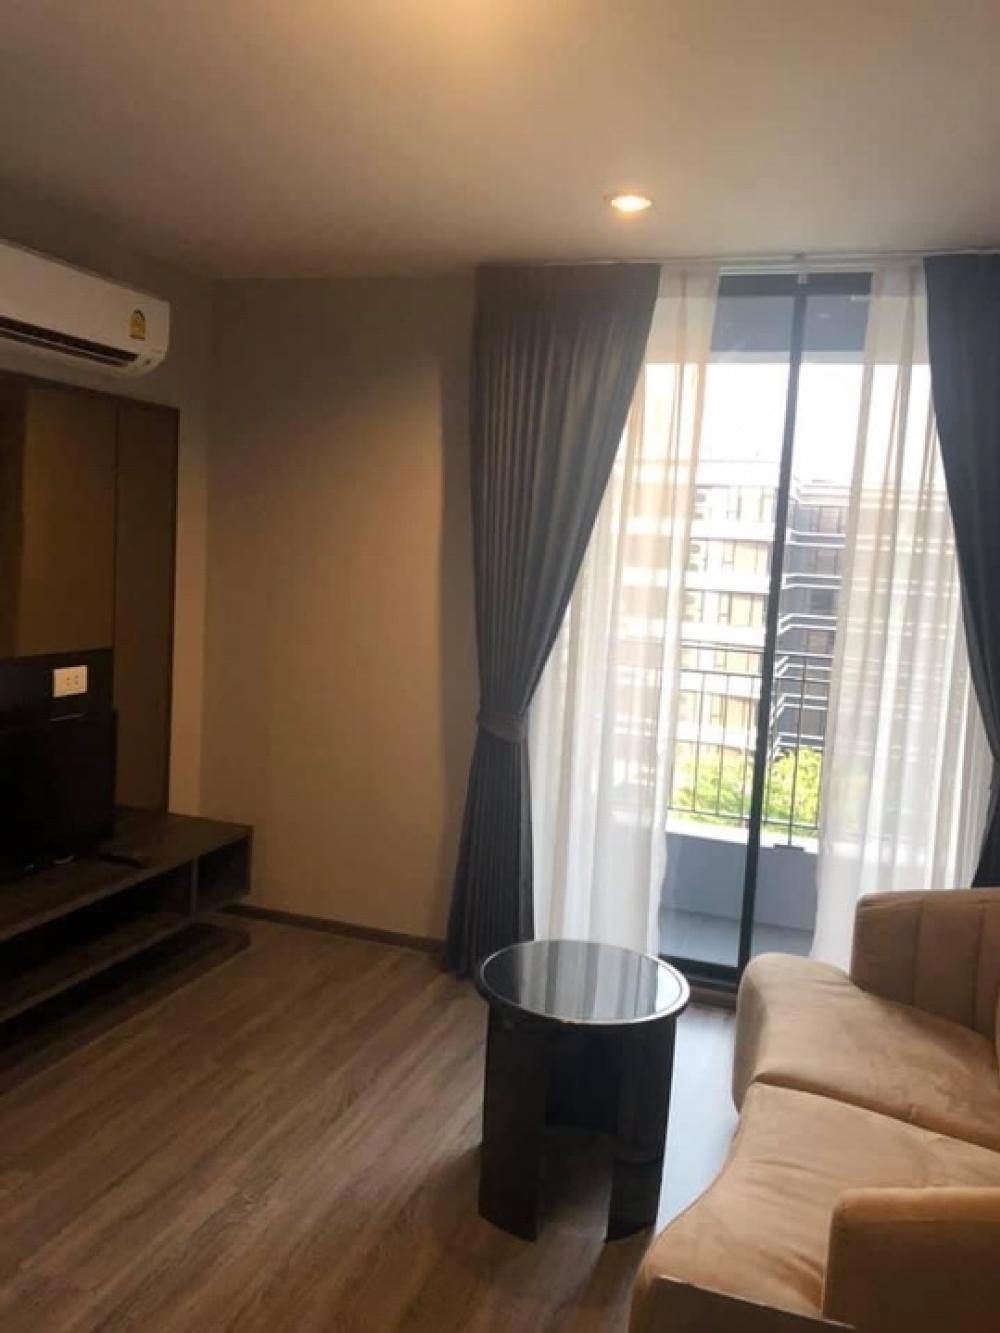 For RentCondoSukhumvit, Asoke, Thonglor : For rent, Ideo Mobi Sukhumvit 40, BTS Ekkamai, size 41 sq.m., 1 bedroom, 7th floor.